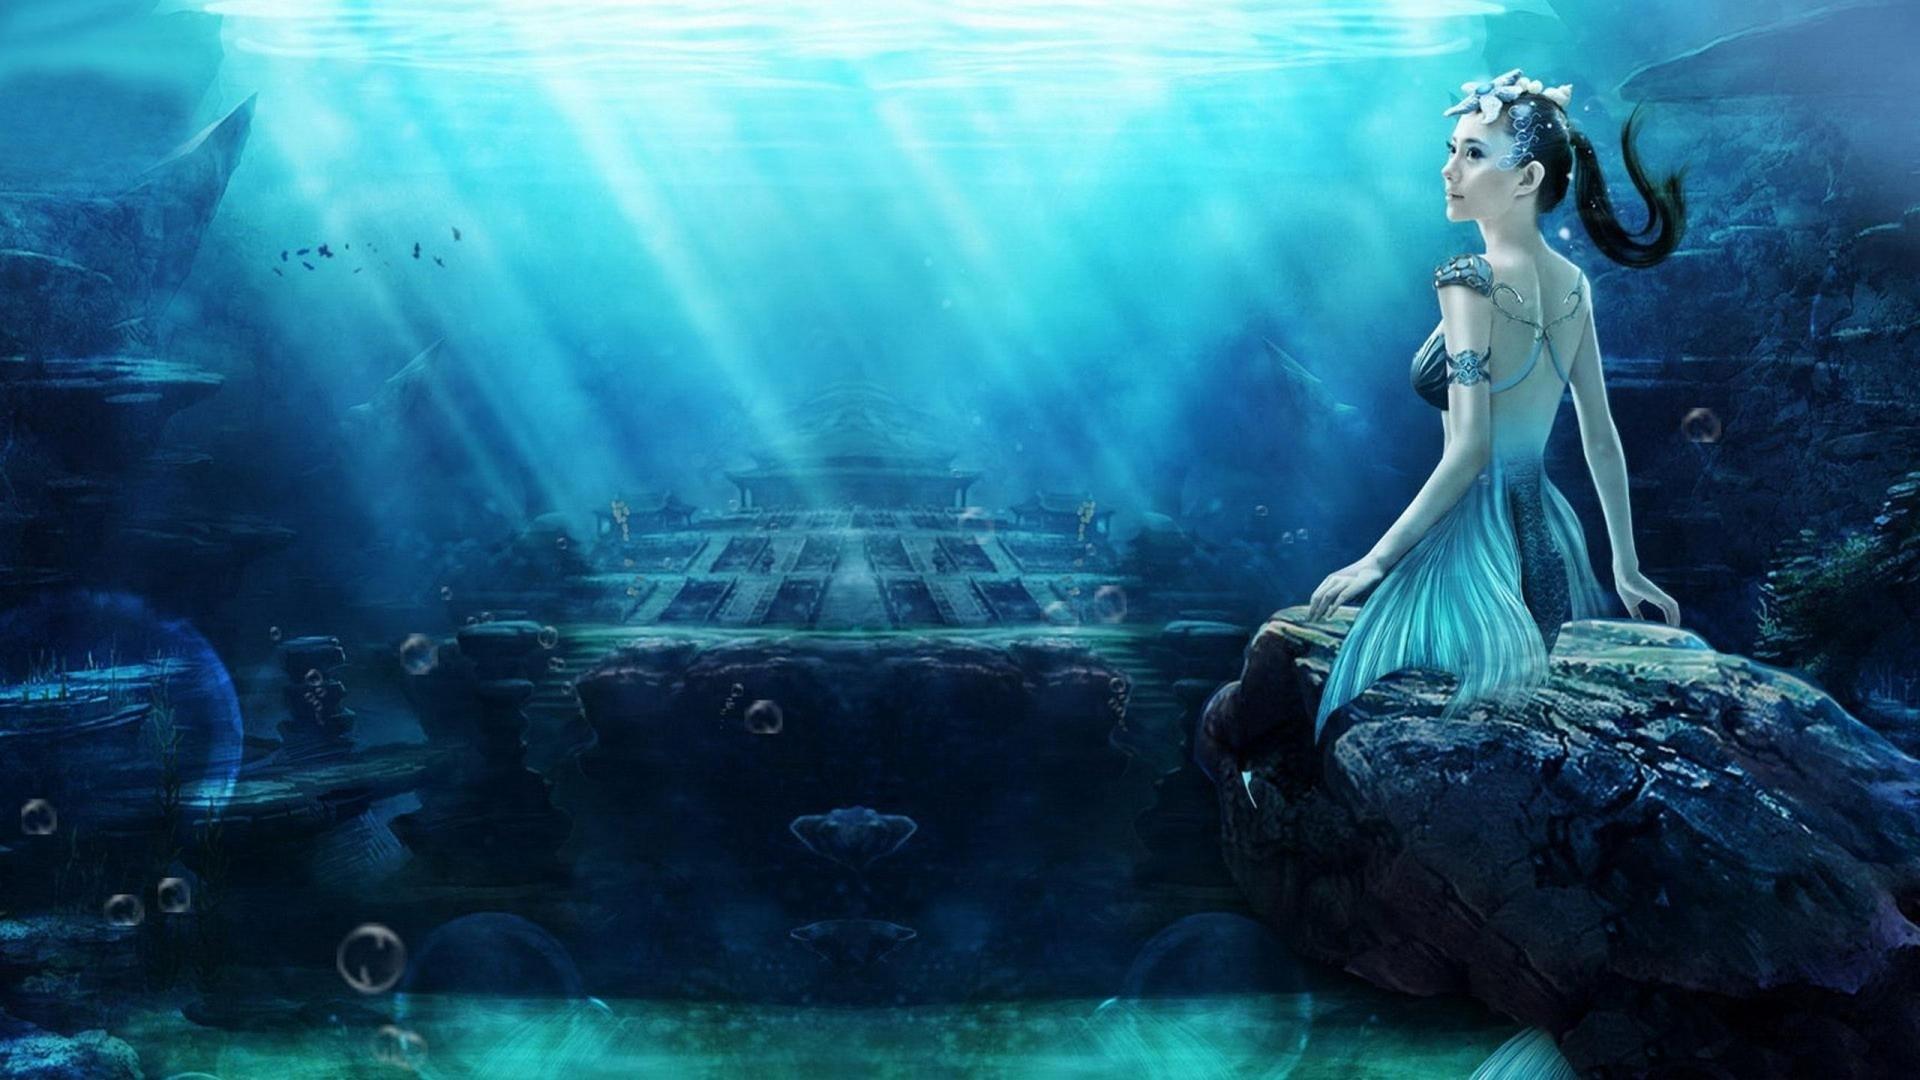 Mermaids wallpaper for computer